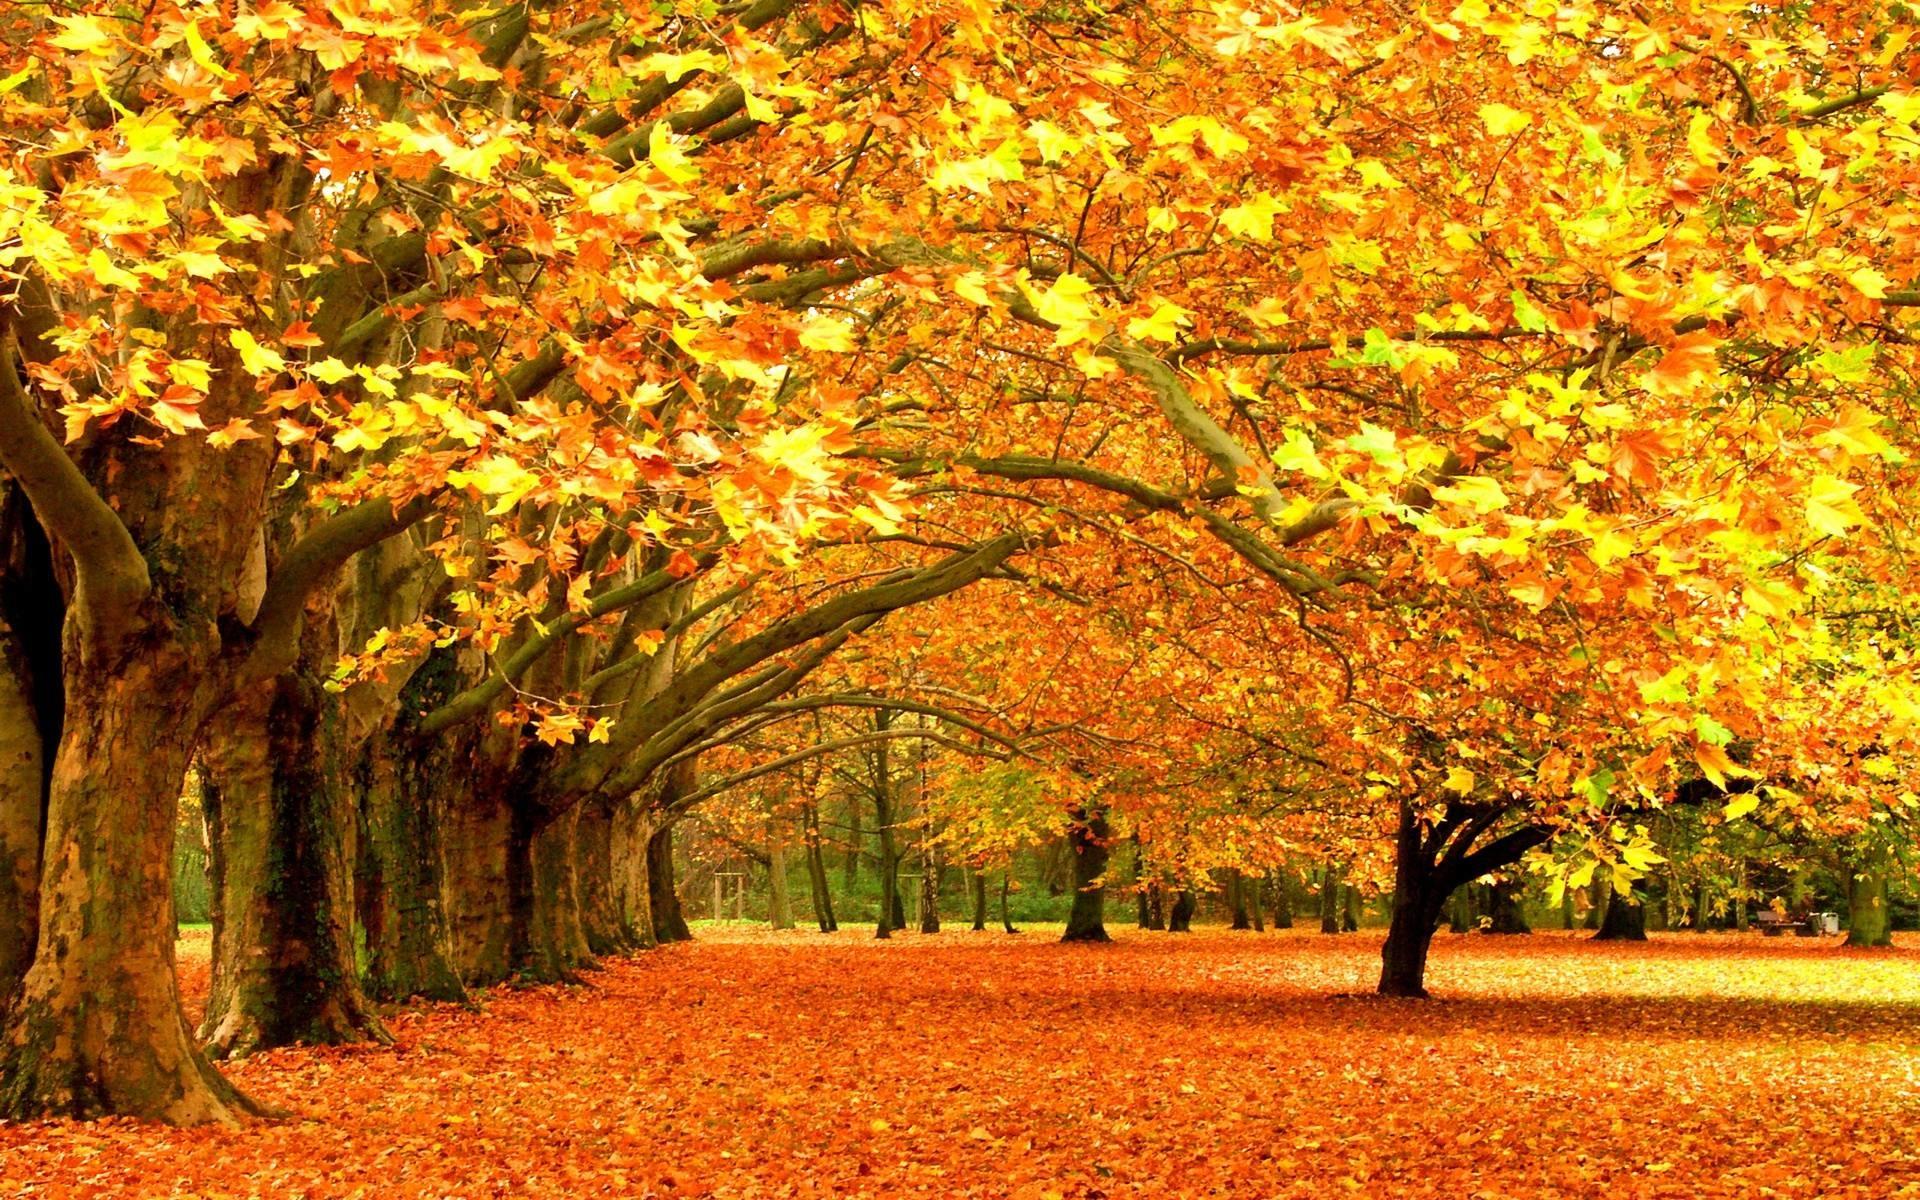 Falling Leaves HD Wallpapers – HD Wallpapers Inn